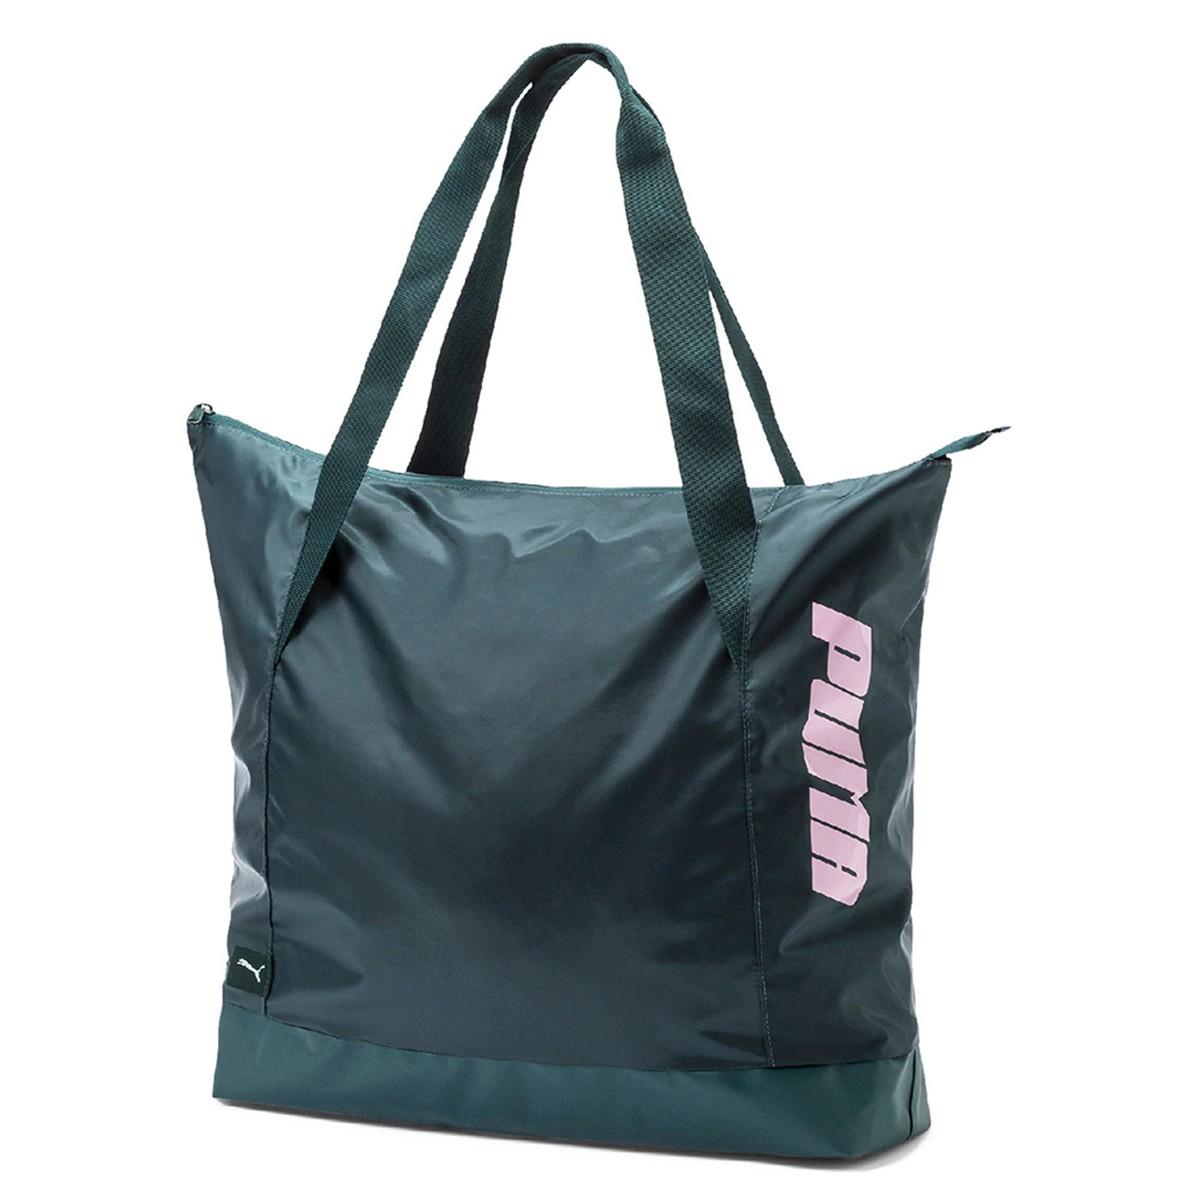 Bolsa Puma Active Training Large Shopper - Verde - Feminina